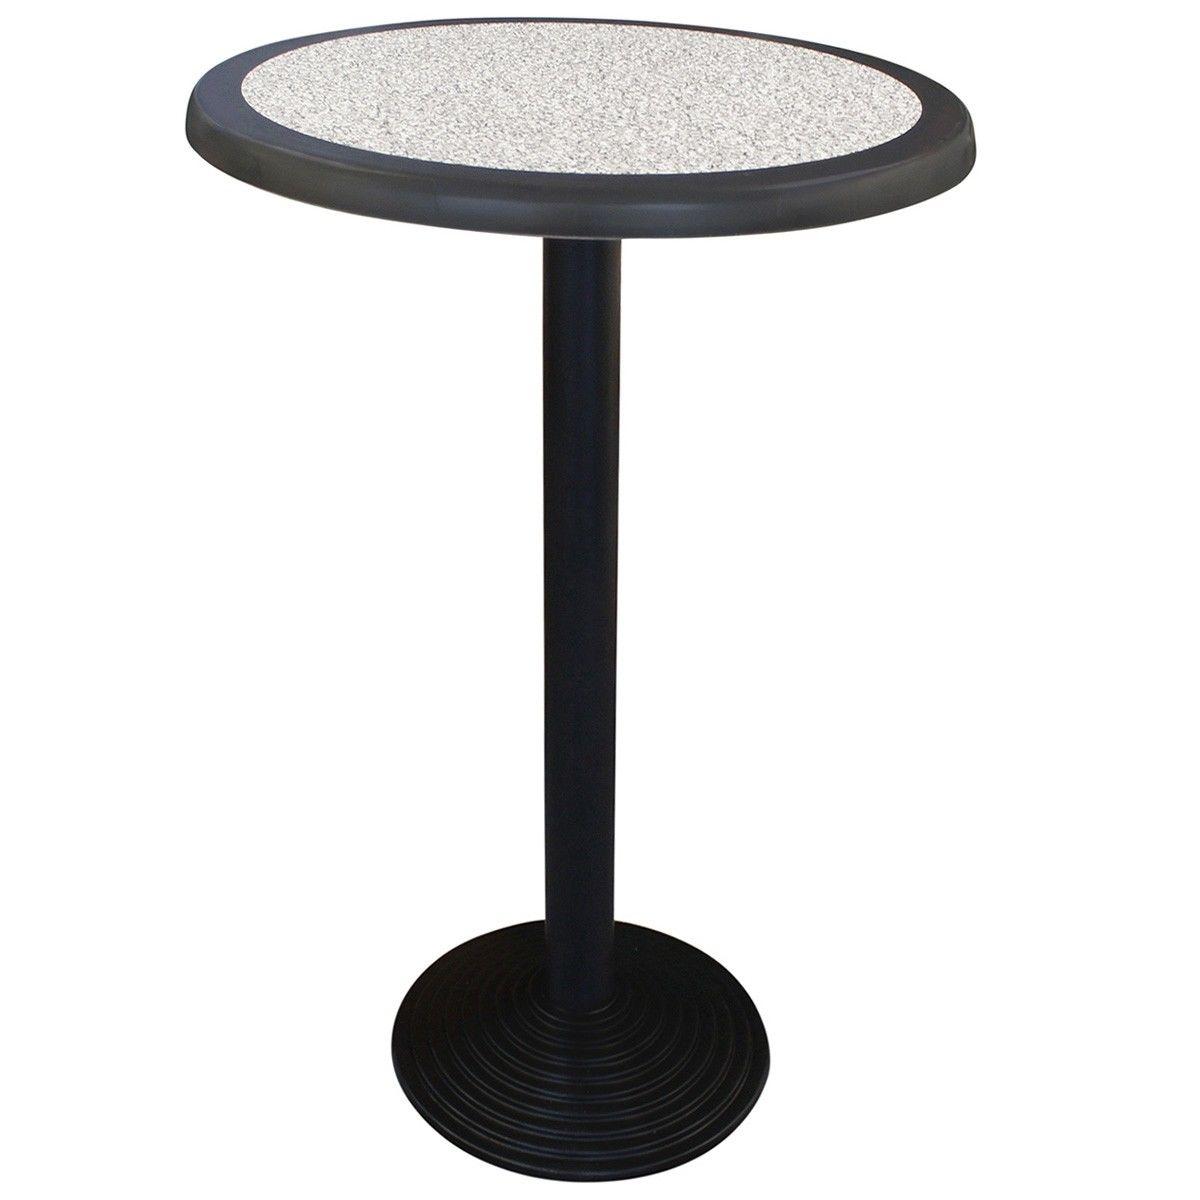 Cascina Commercial Grade Round Bar Table, 70cm, Pebble / Black